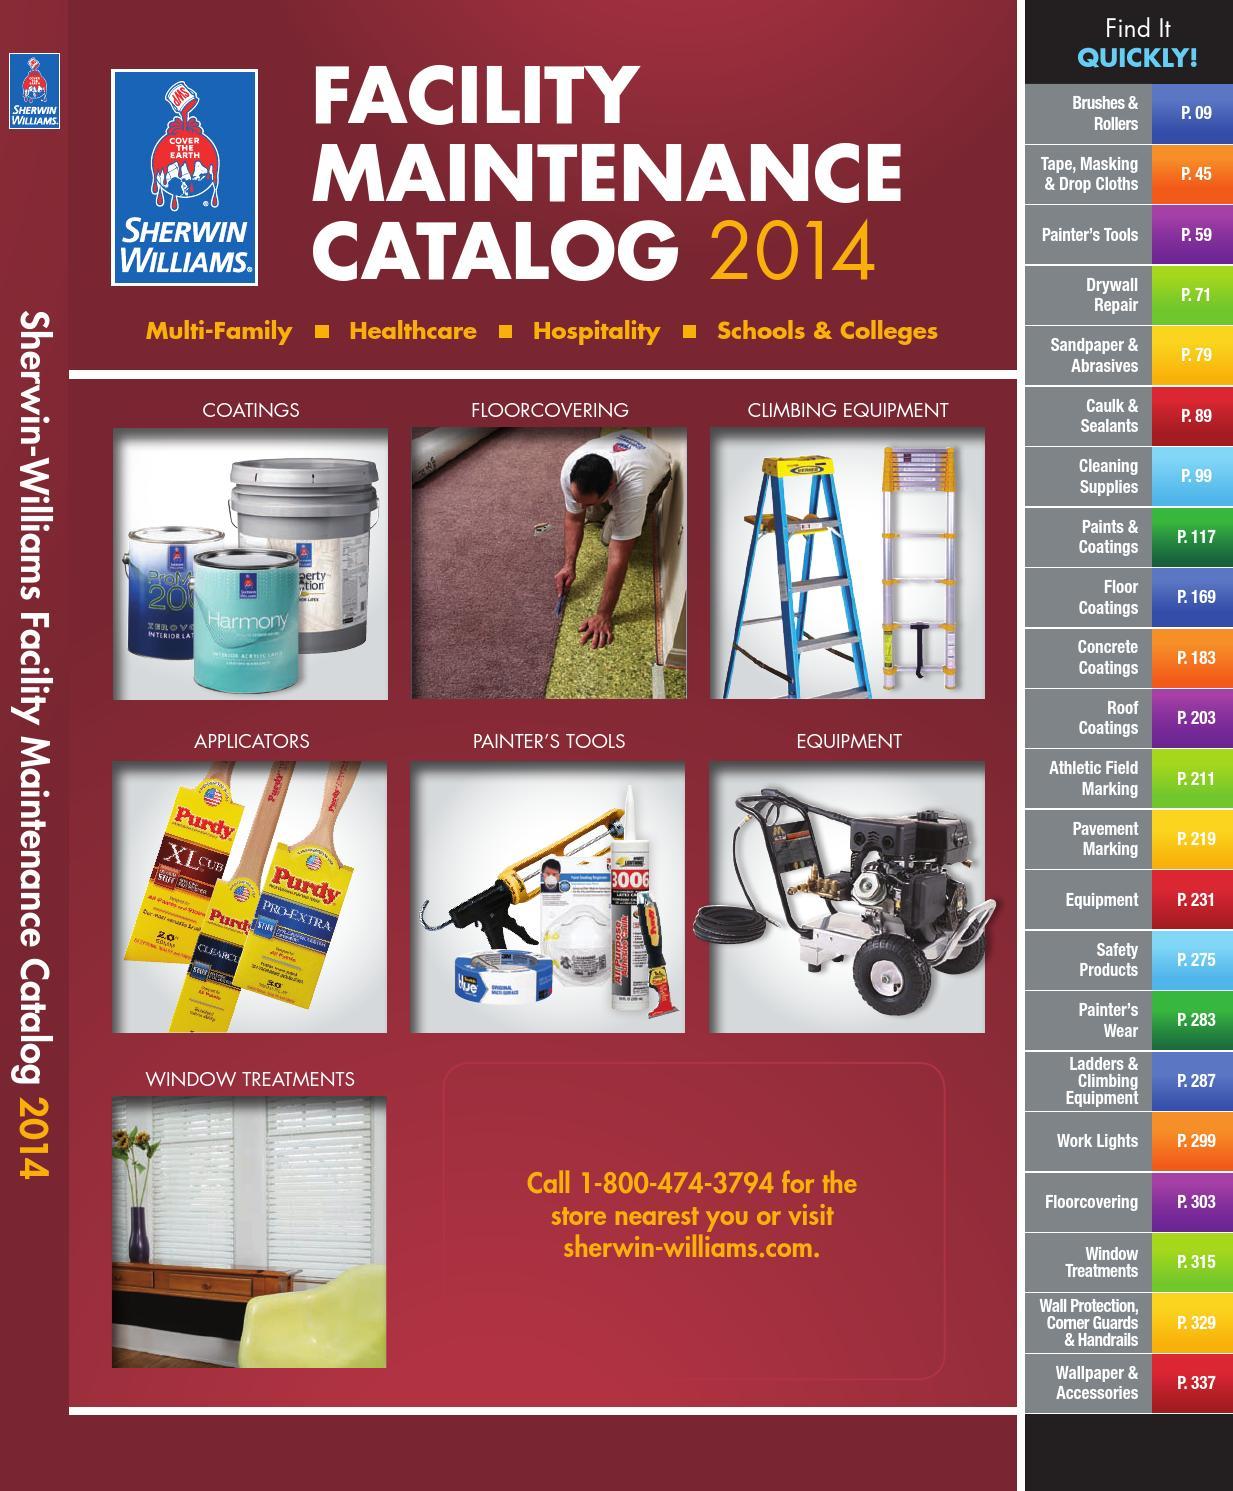 Facility maintenance catalog 2014 by sherwin williams issuu nvjuhfo Images